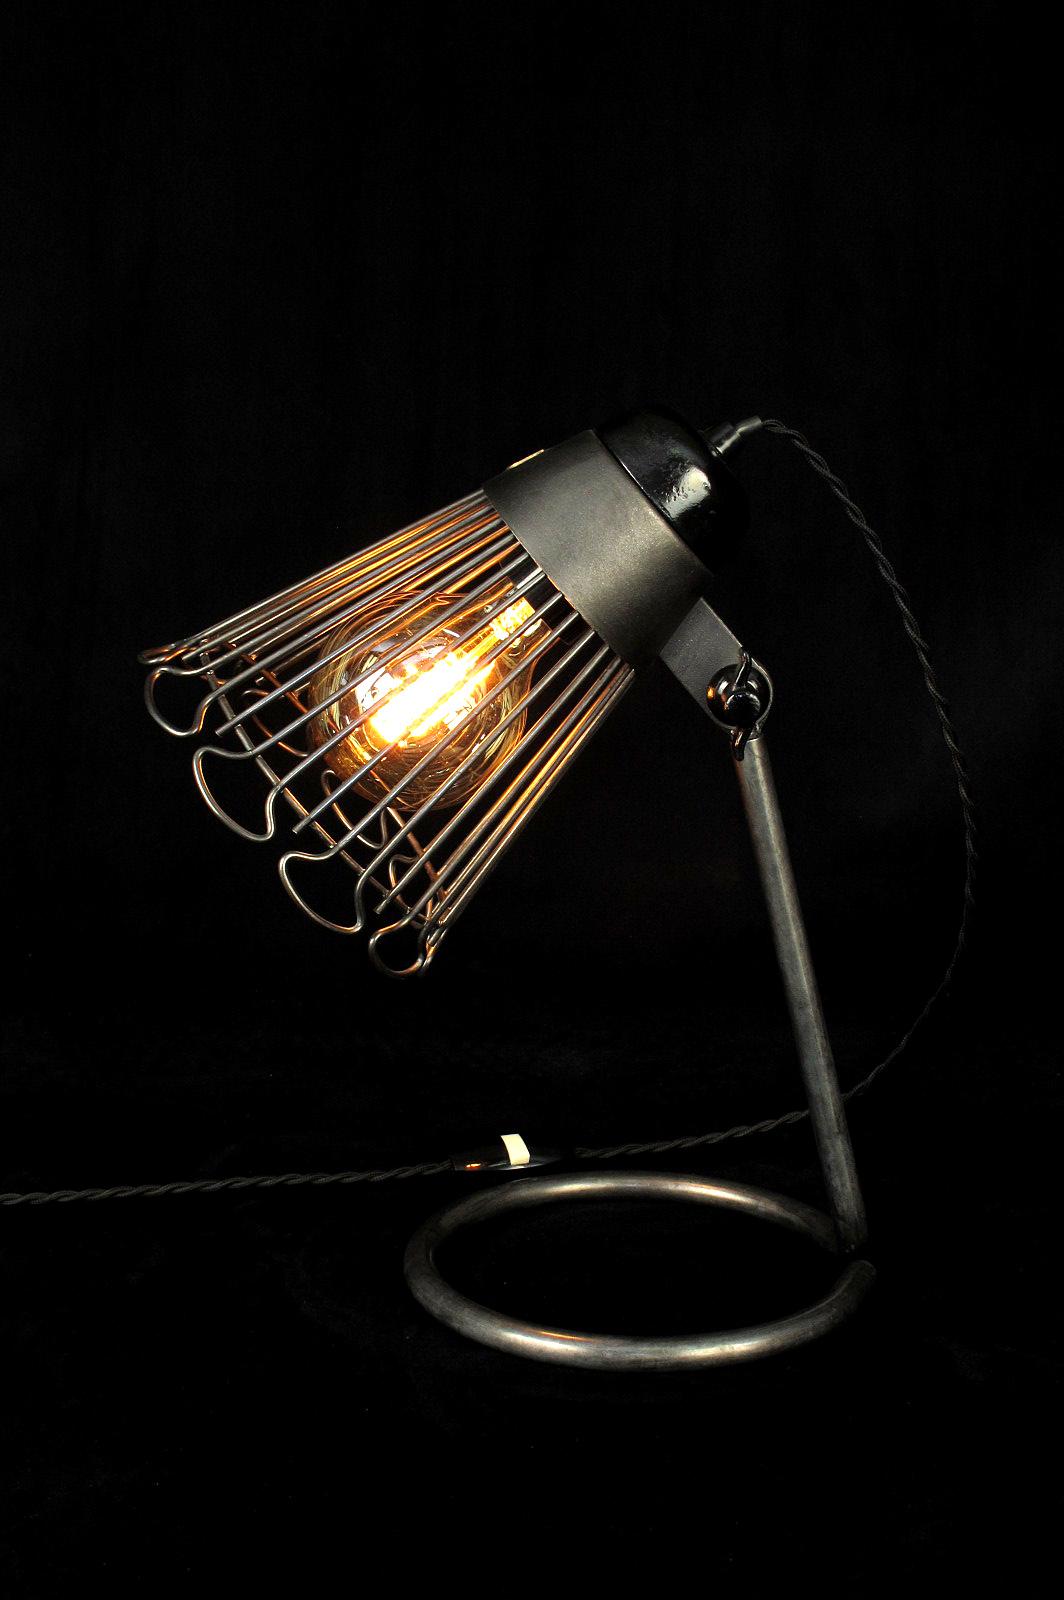 ancienne lampe m dicale philips old school bazaar. Black Bedroom Furniture Sets. Home Design Ideas